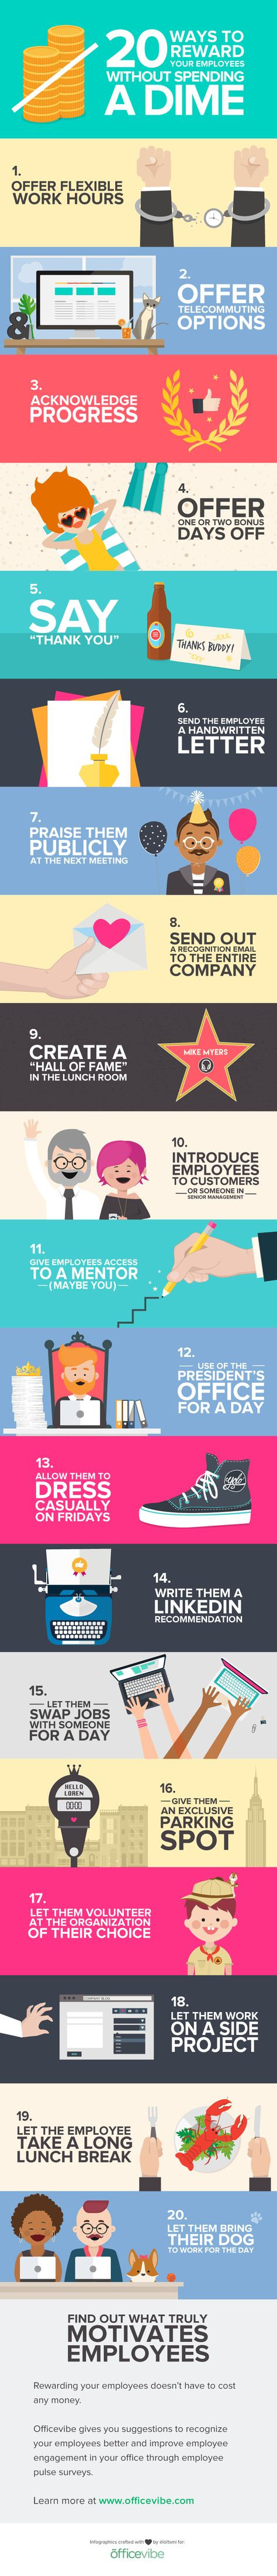 20 Ways to Reward Employees Without Spending Money